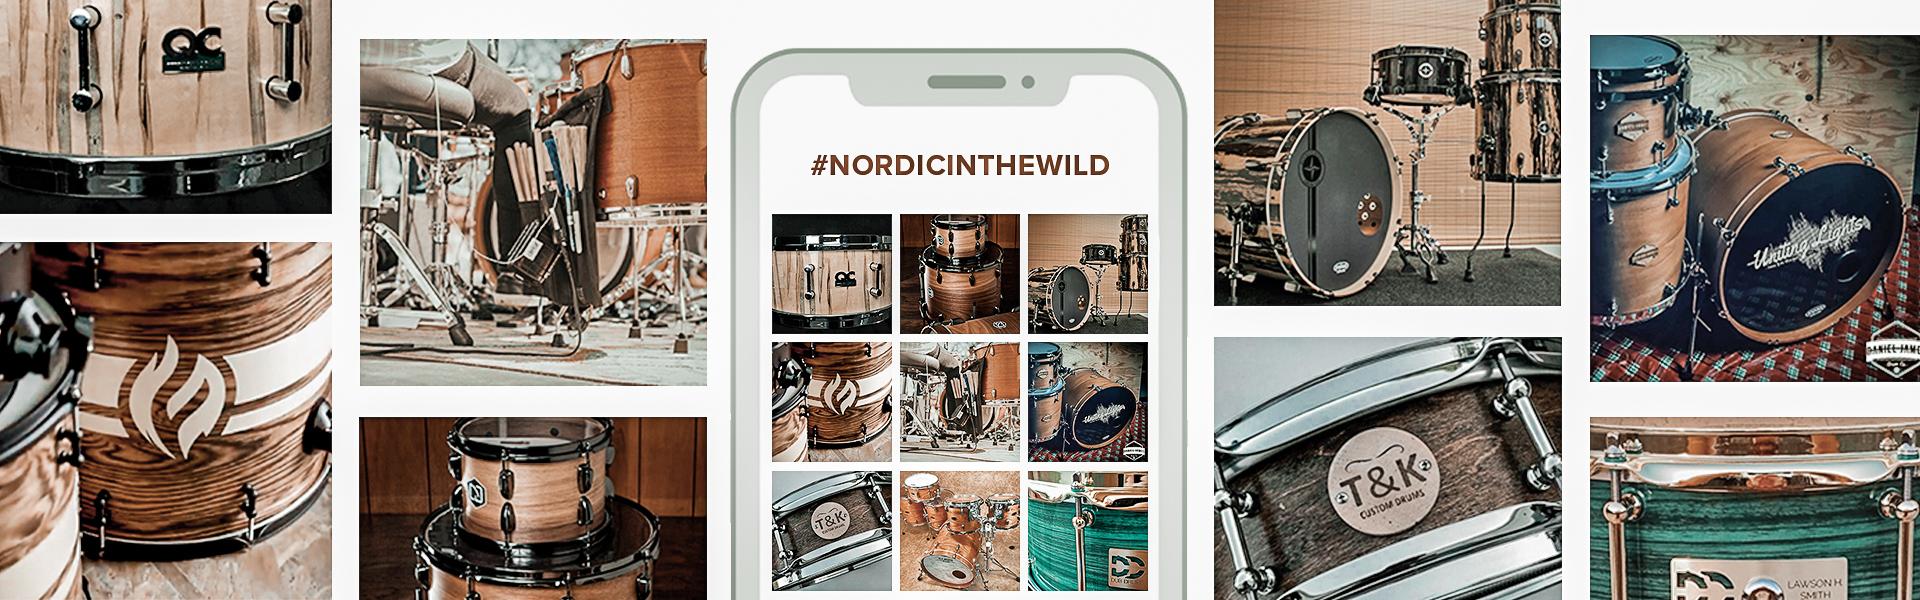 Nordic In The Wild Module.jpg